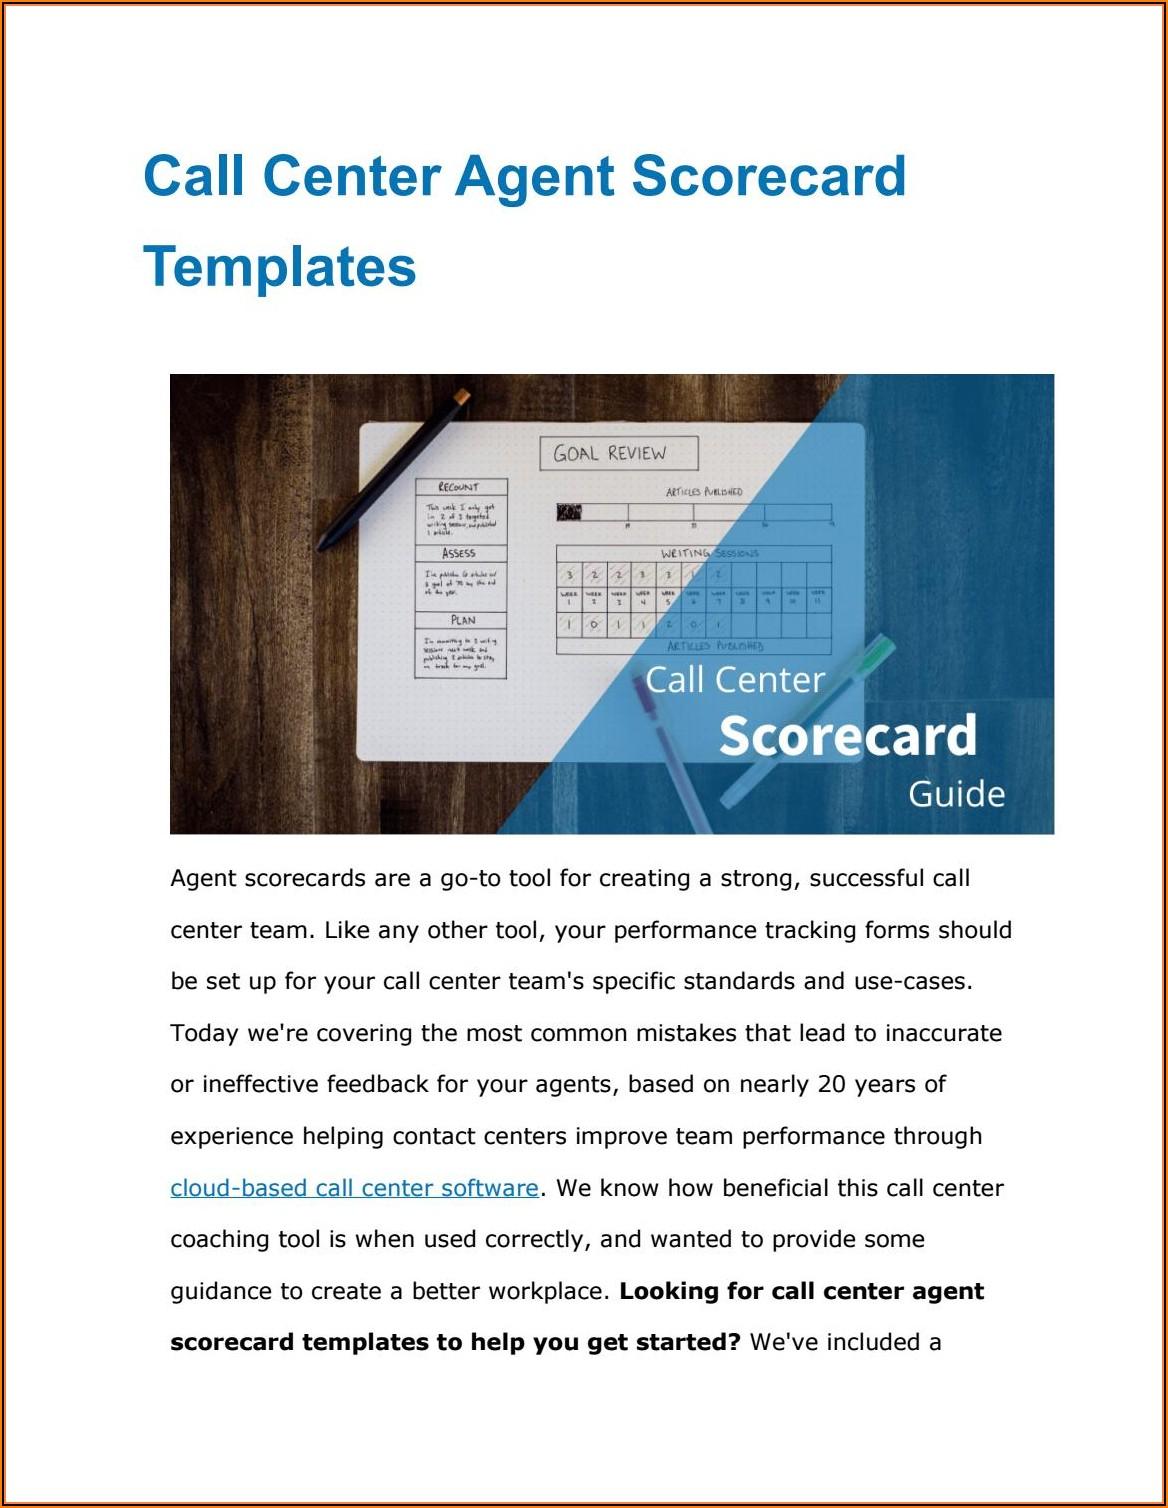 Call Center Agent Scorecard Template